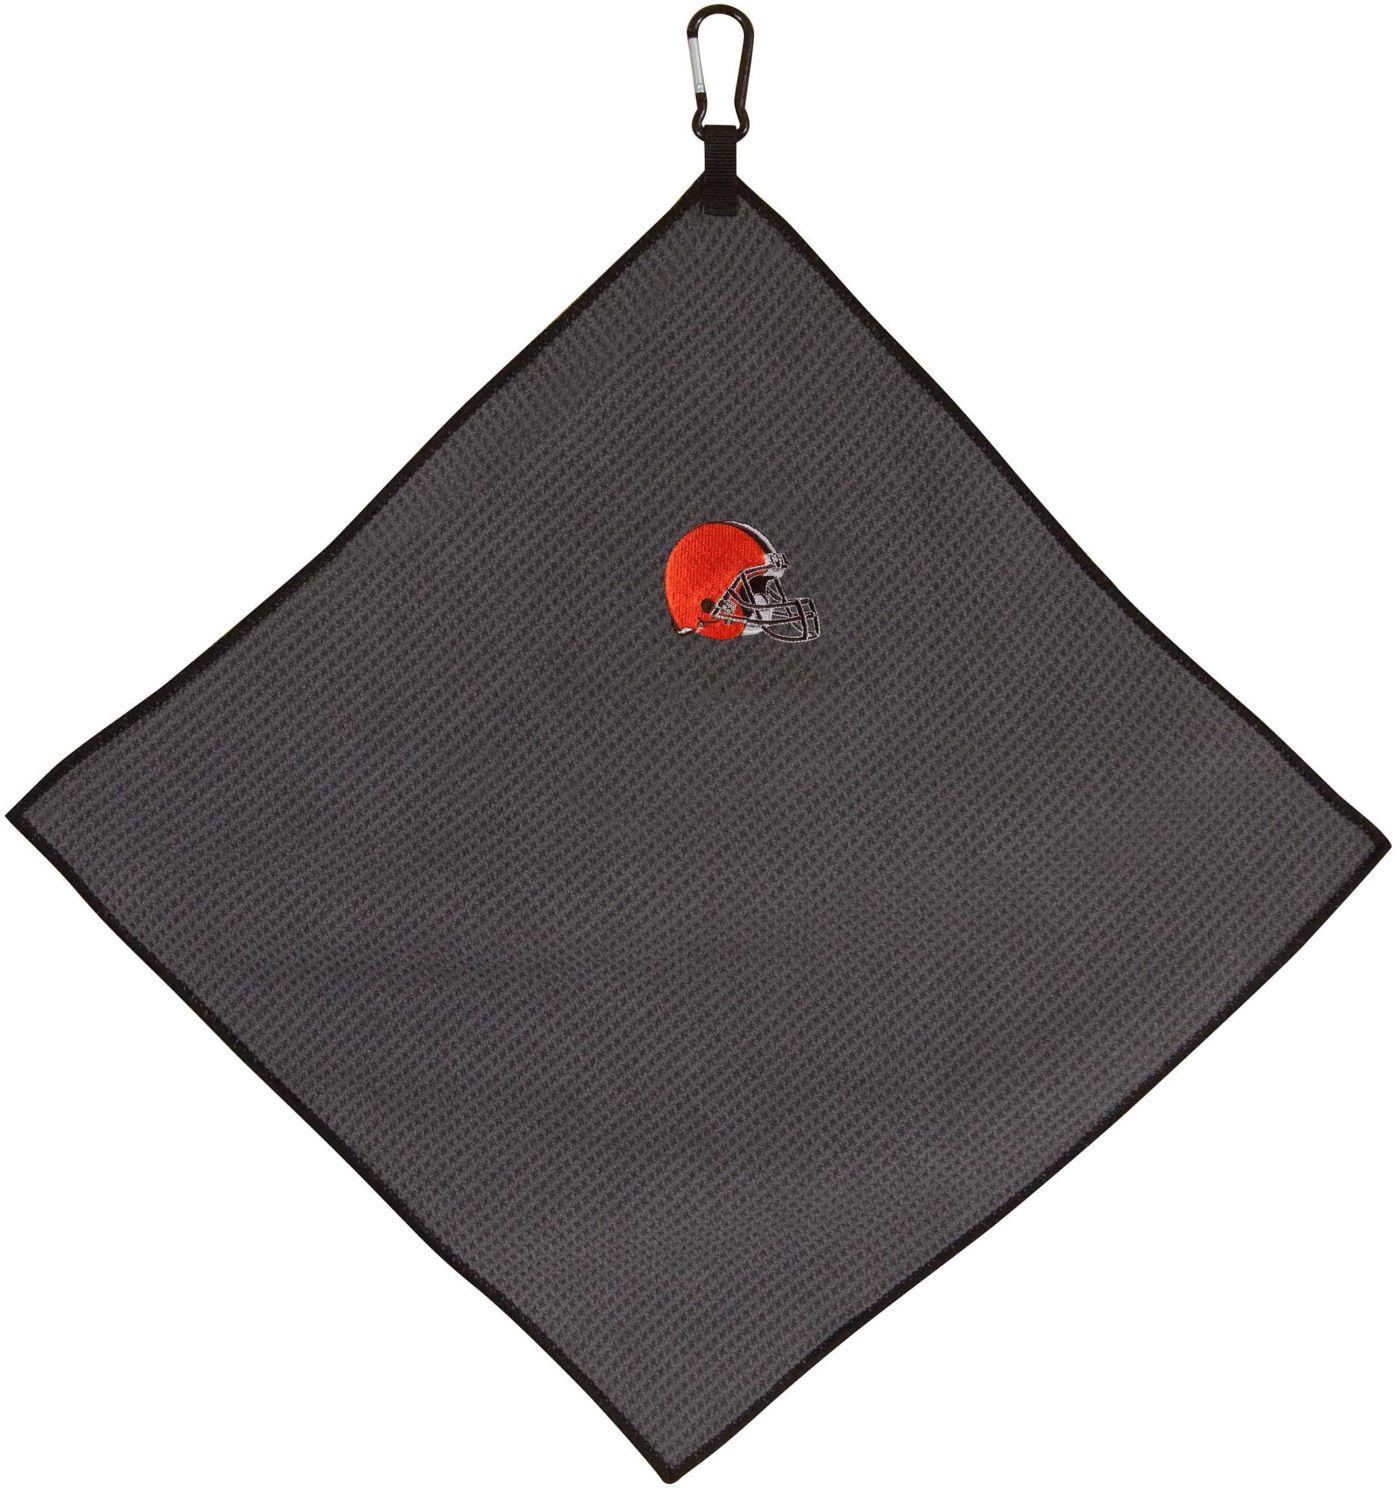 "Team Effort Cleveland Browns 15"" x 15"" Microfiber Golf Towel"